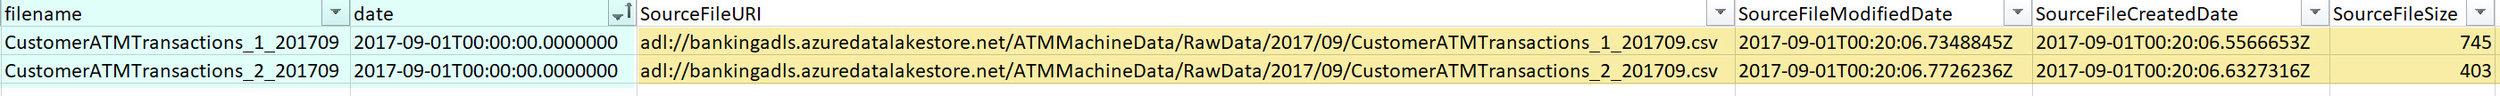 U-SQL_File_Properties_Output.jpg